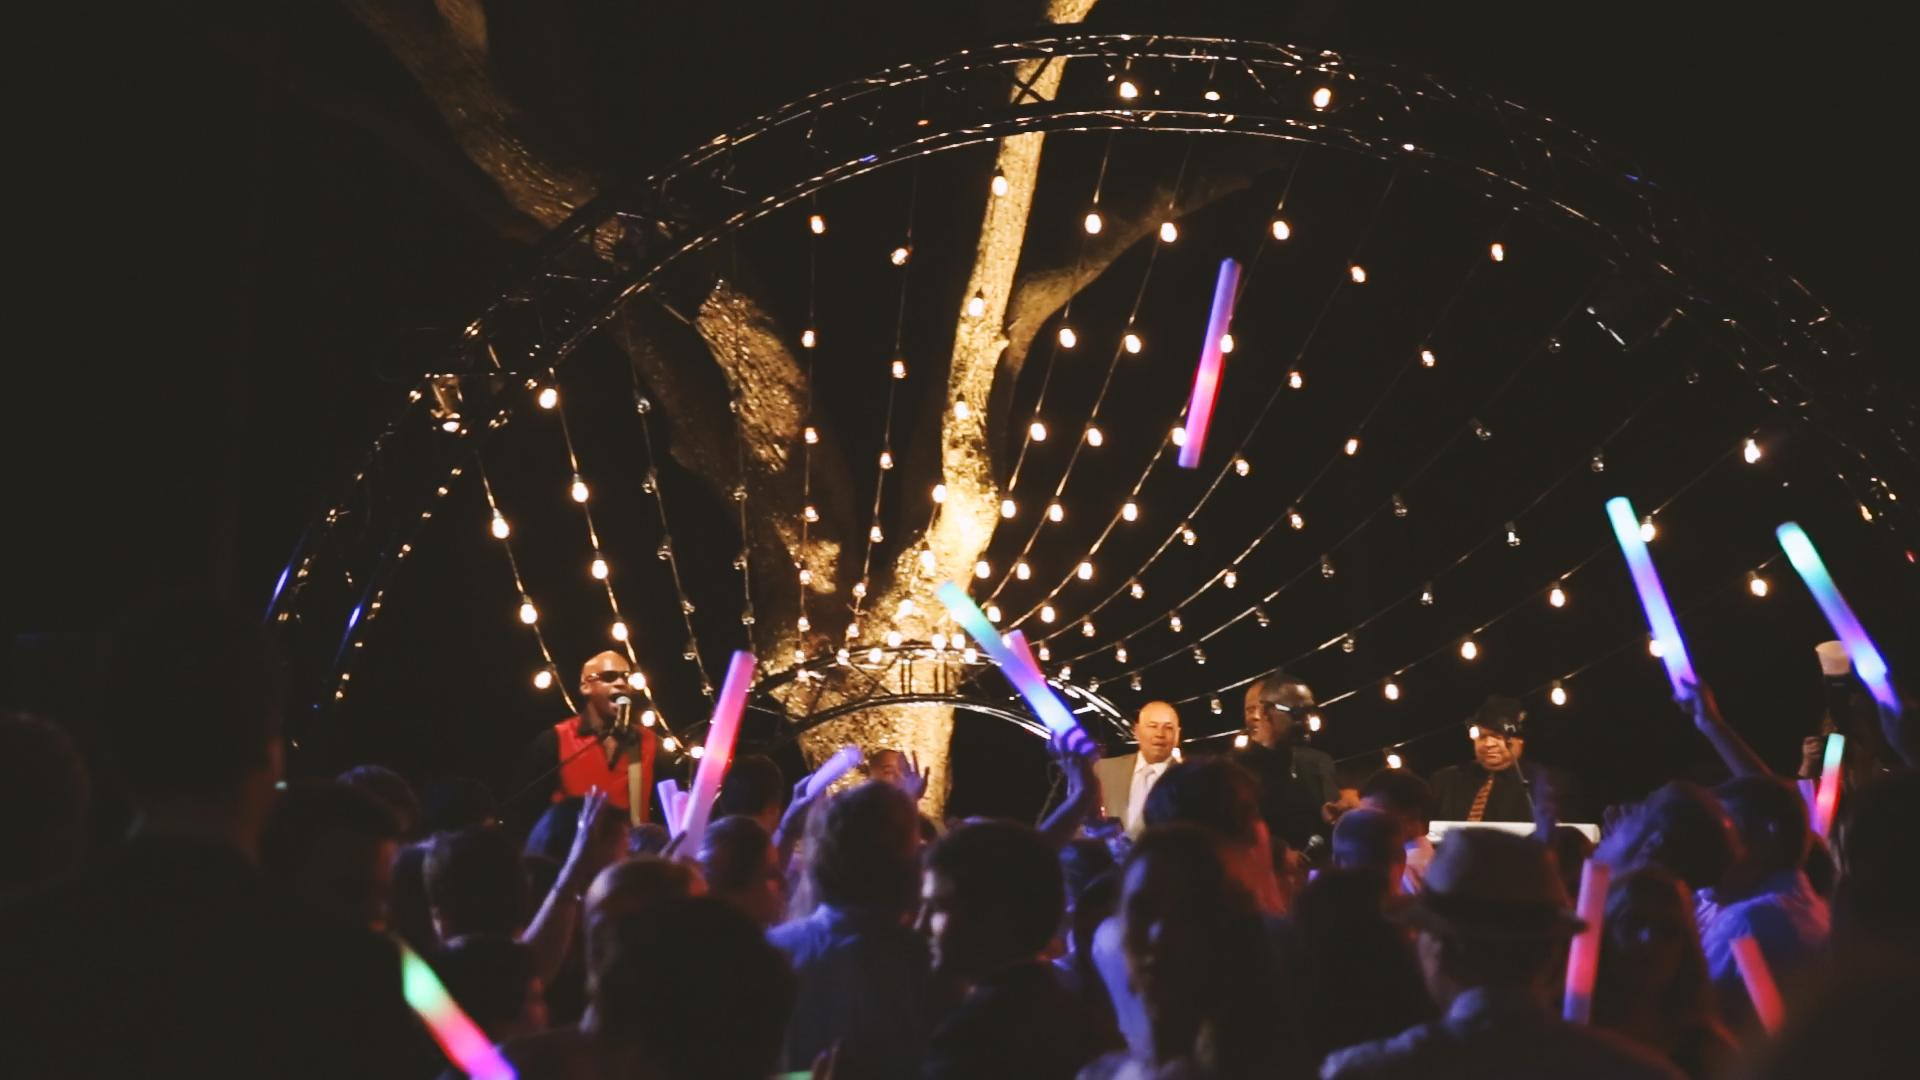 Glow Sticks - Bride Film